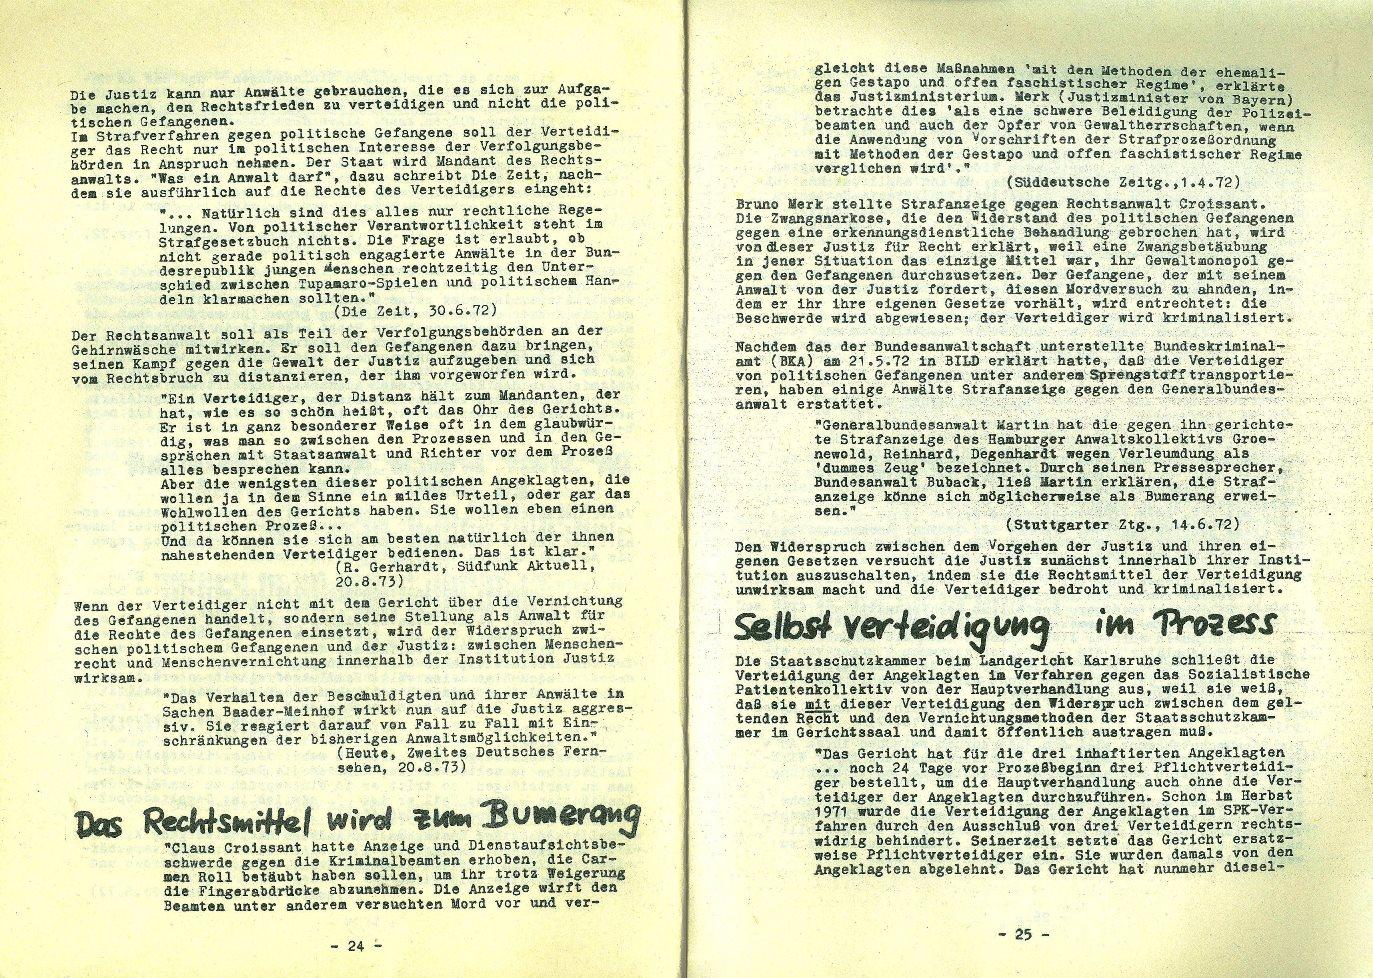 Heidelberg_Folterkomitee028